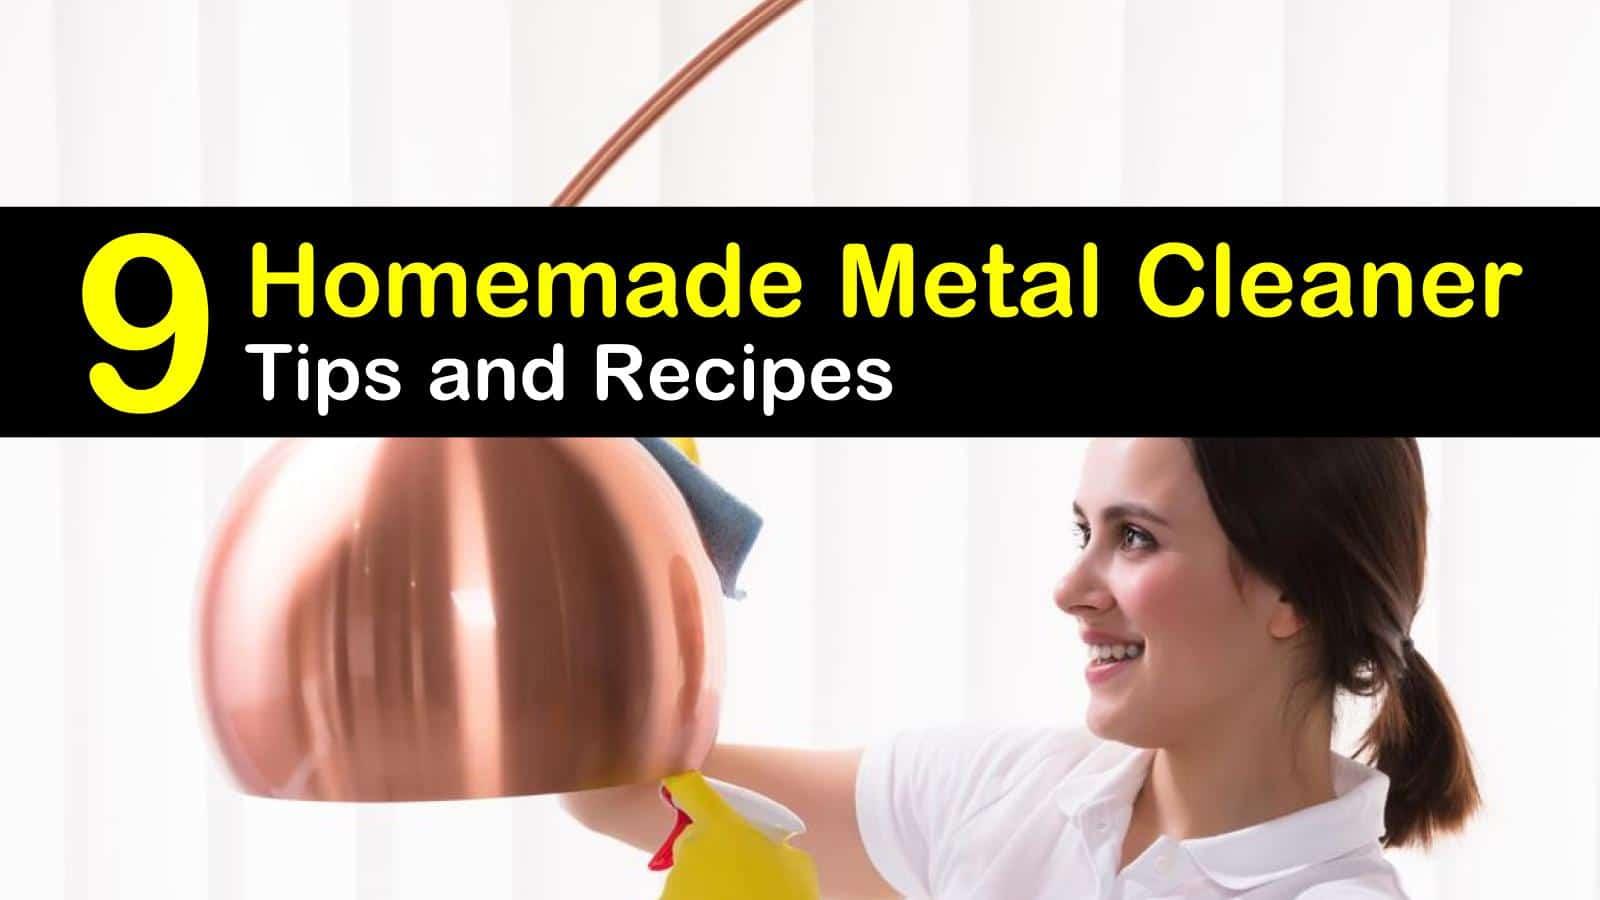 homemade metal cleaner titleimg1